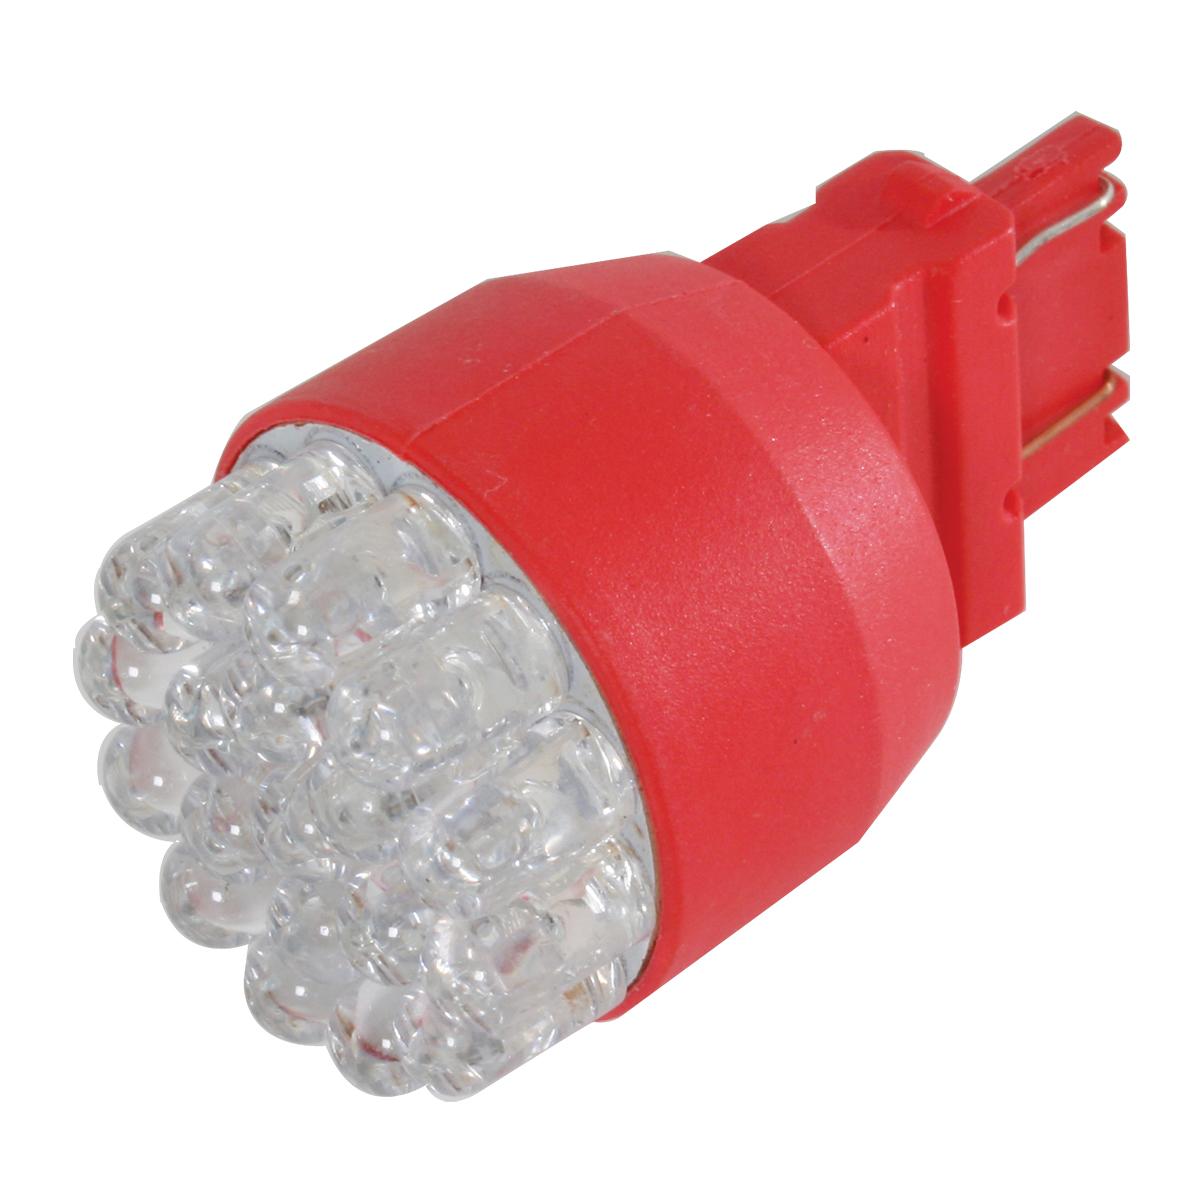 83991 Red 3157 Single Directional 19 LED Light Bulb